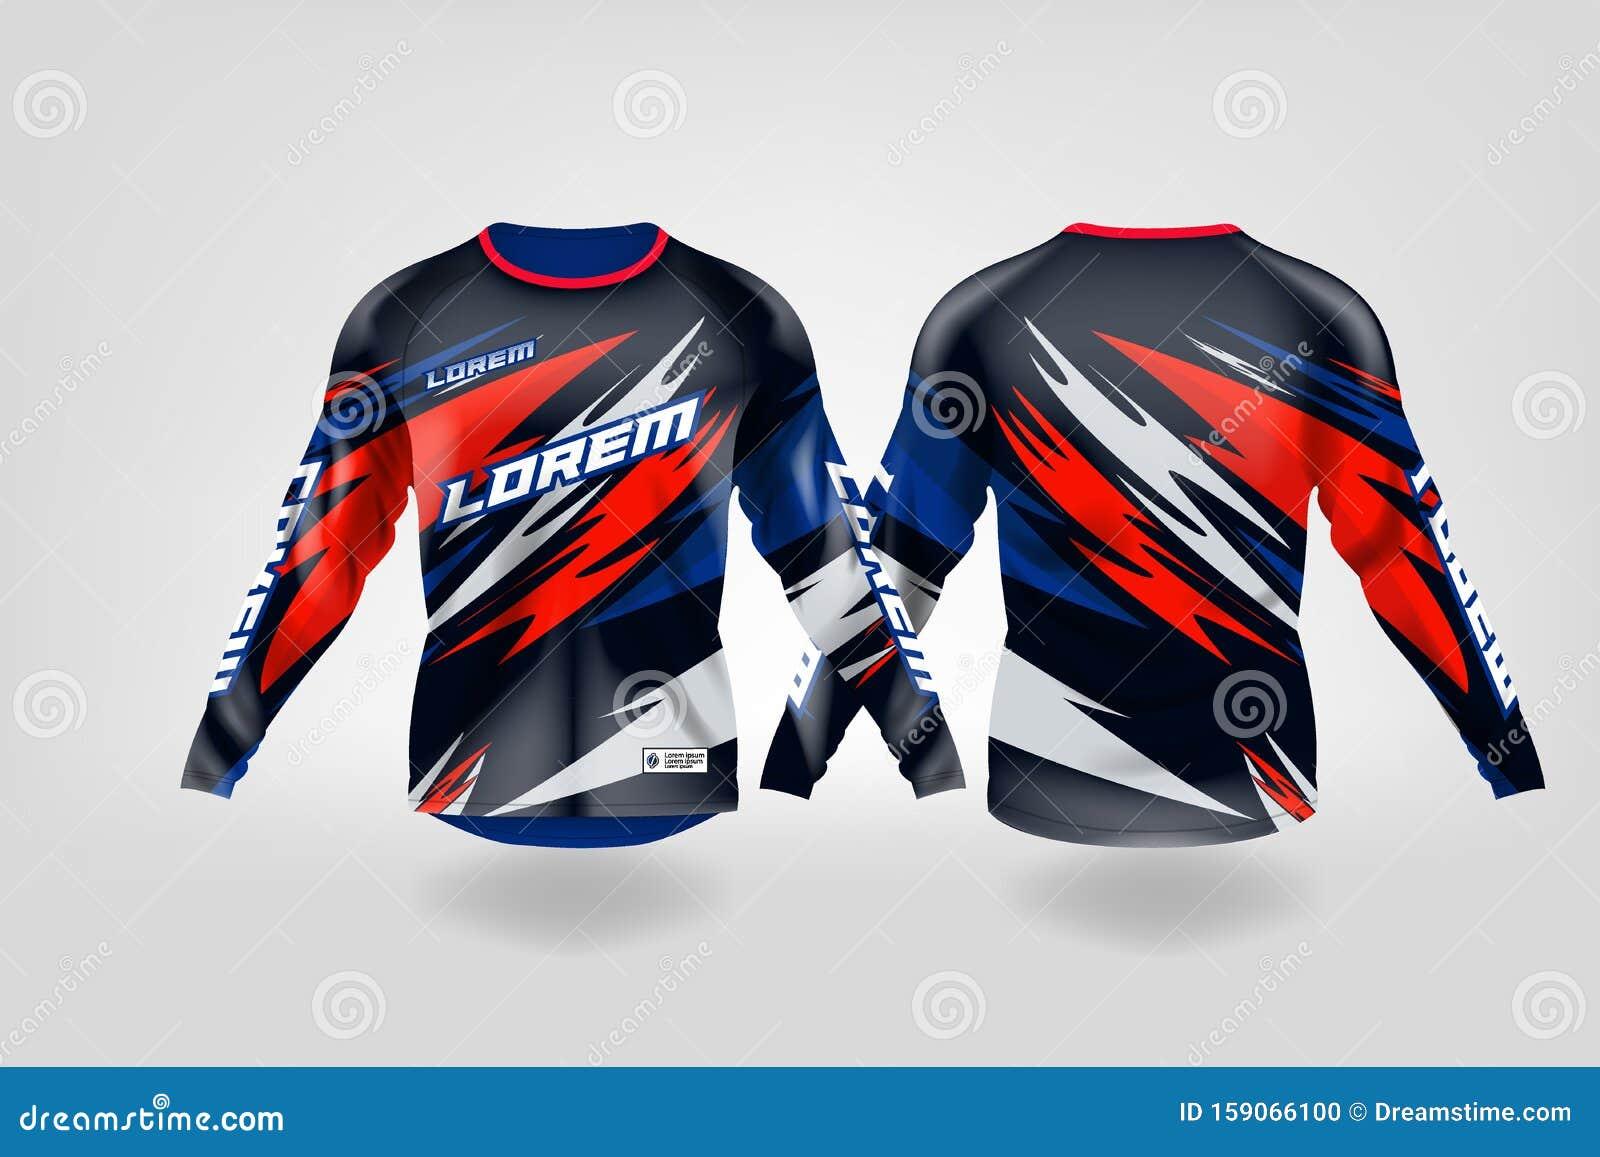 T Shirt Sport Design Template Long Sleeve Soccer Jersey Mockup For Football Club Uniform Front And Back View Motocross Jersey Mt Stock Illustration Illustration Of Back Mens 159066100